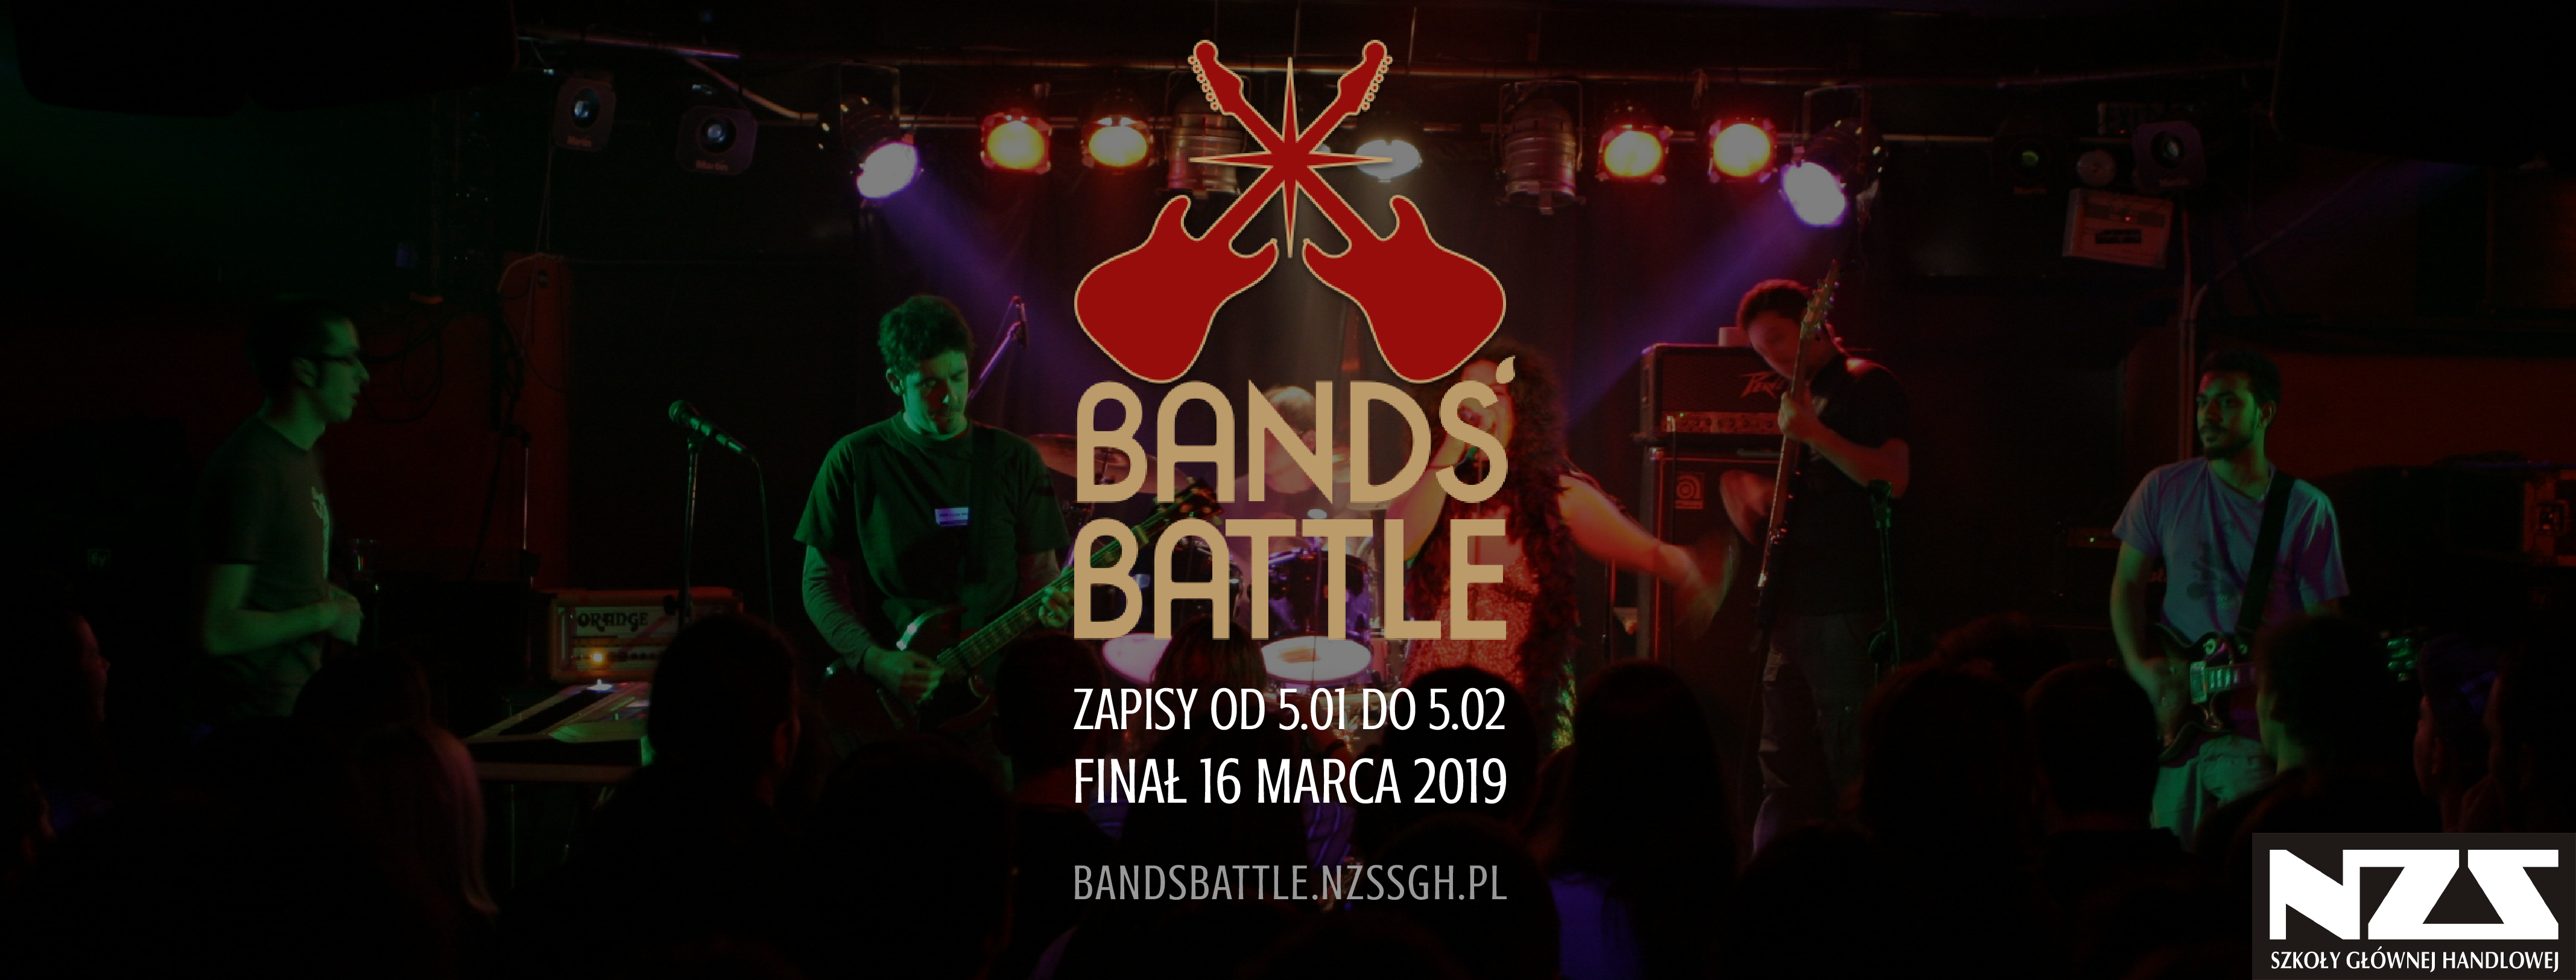 Bands' Battle